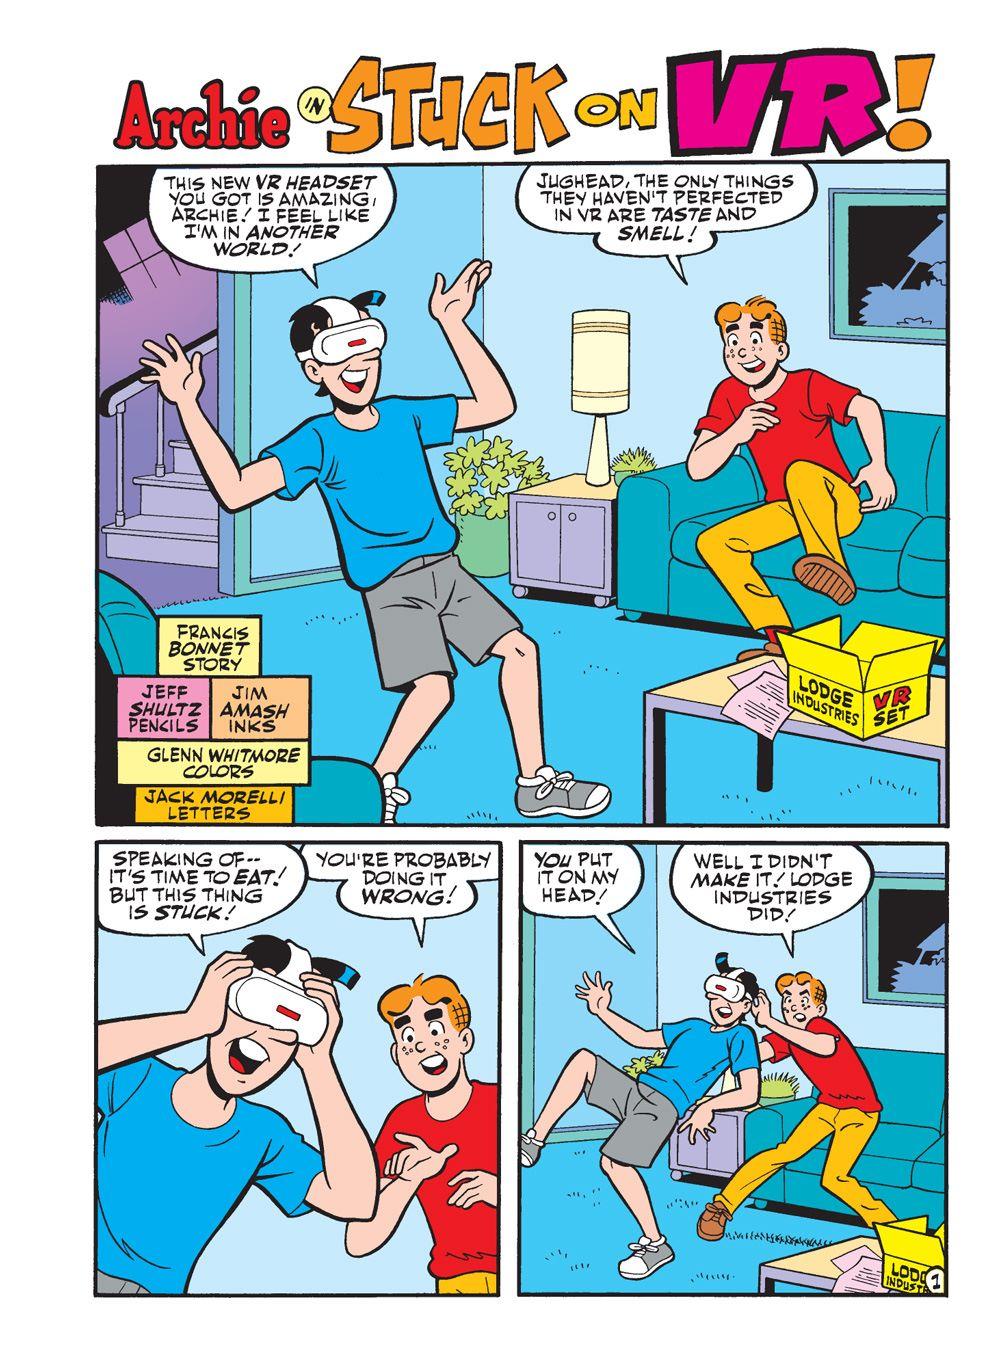 WorldOfArchieJumboComicsDigest_111_2 ComicList Previews: WORLD OF ARCHIE JUMBO COMICS DIGEST #111